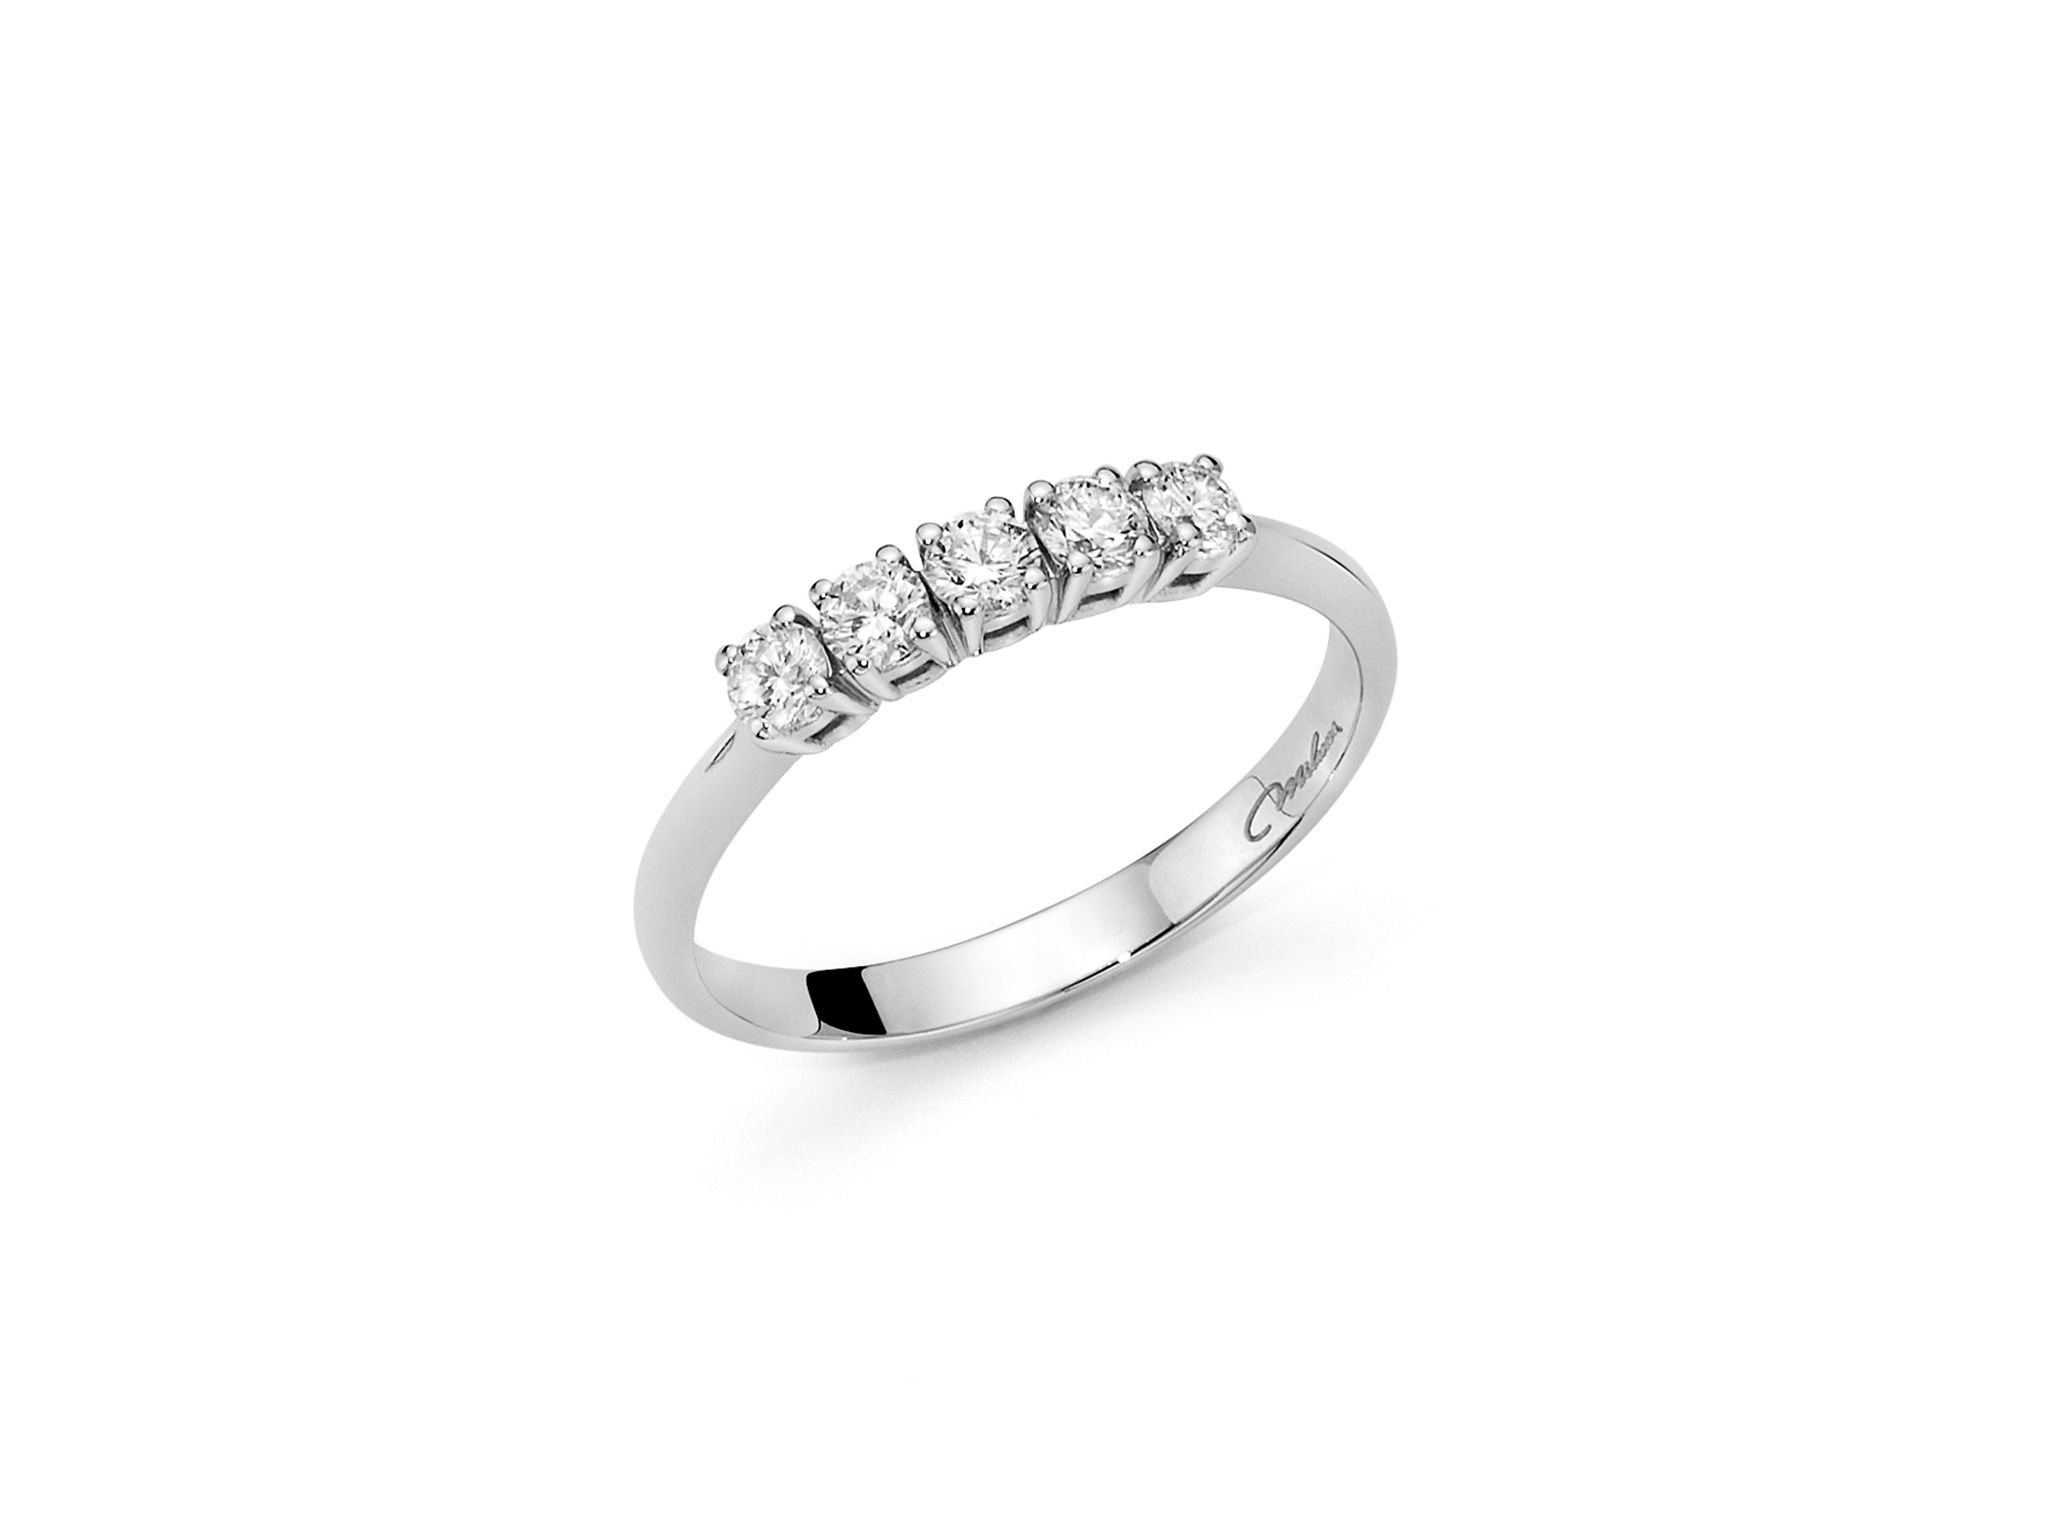 Fedina con diamanti - LID3228-020G7